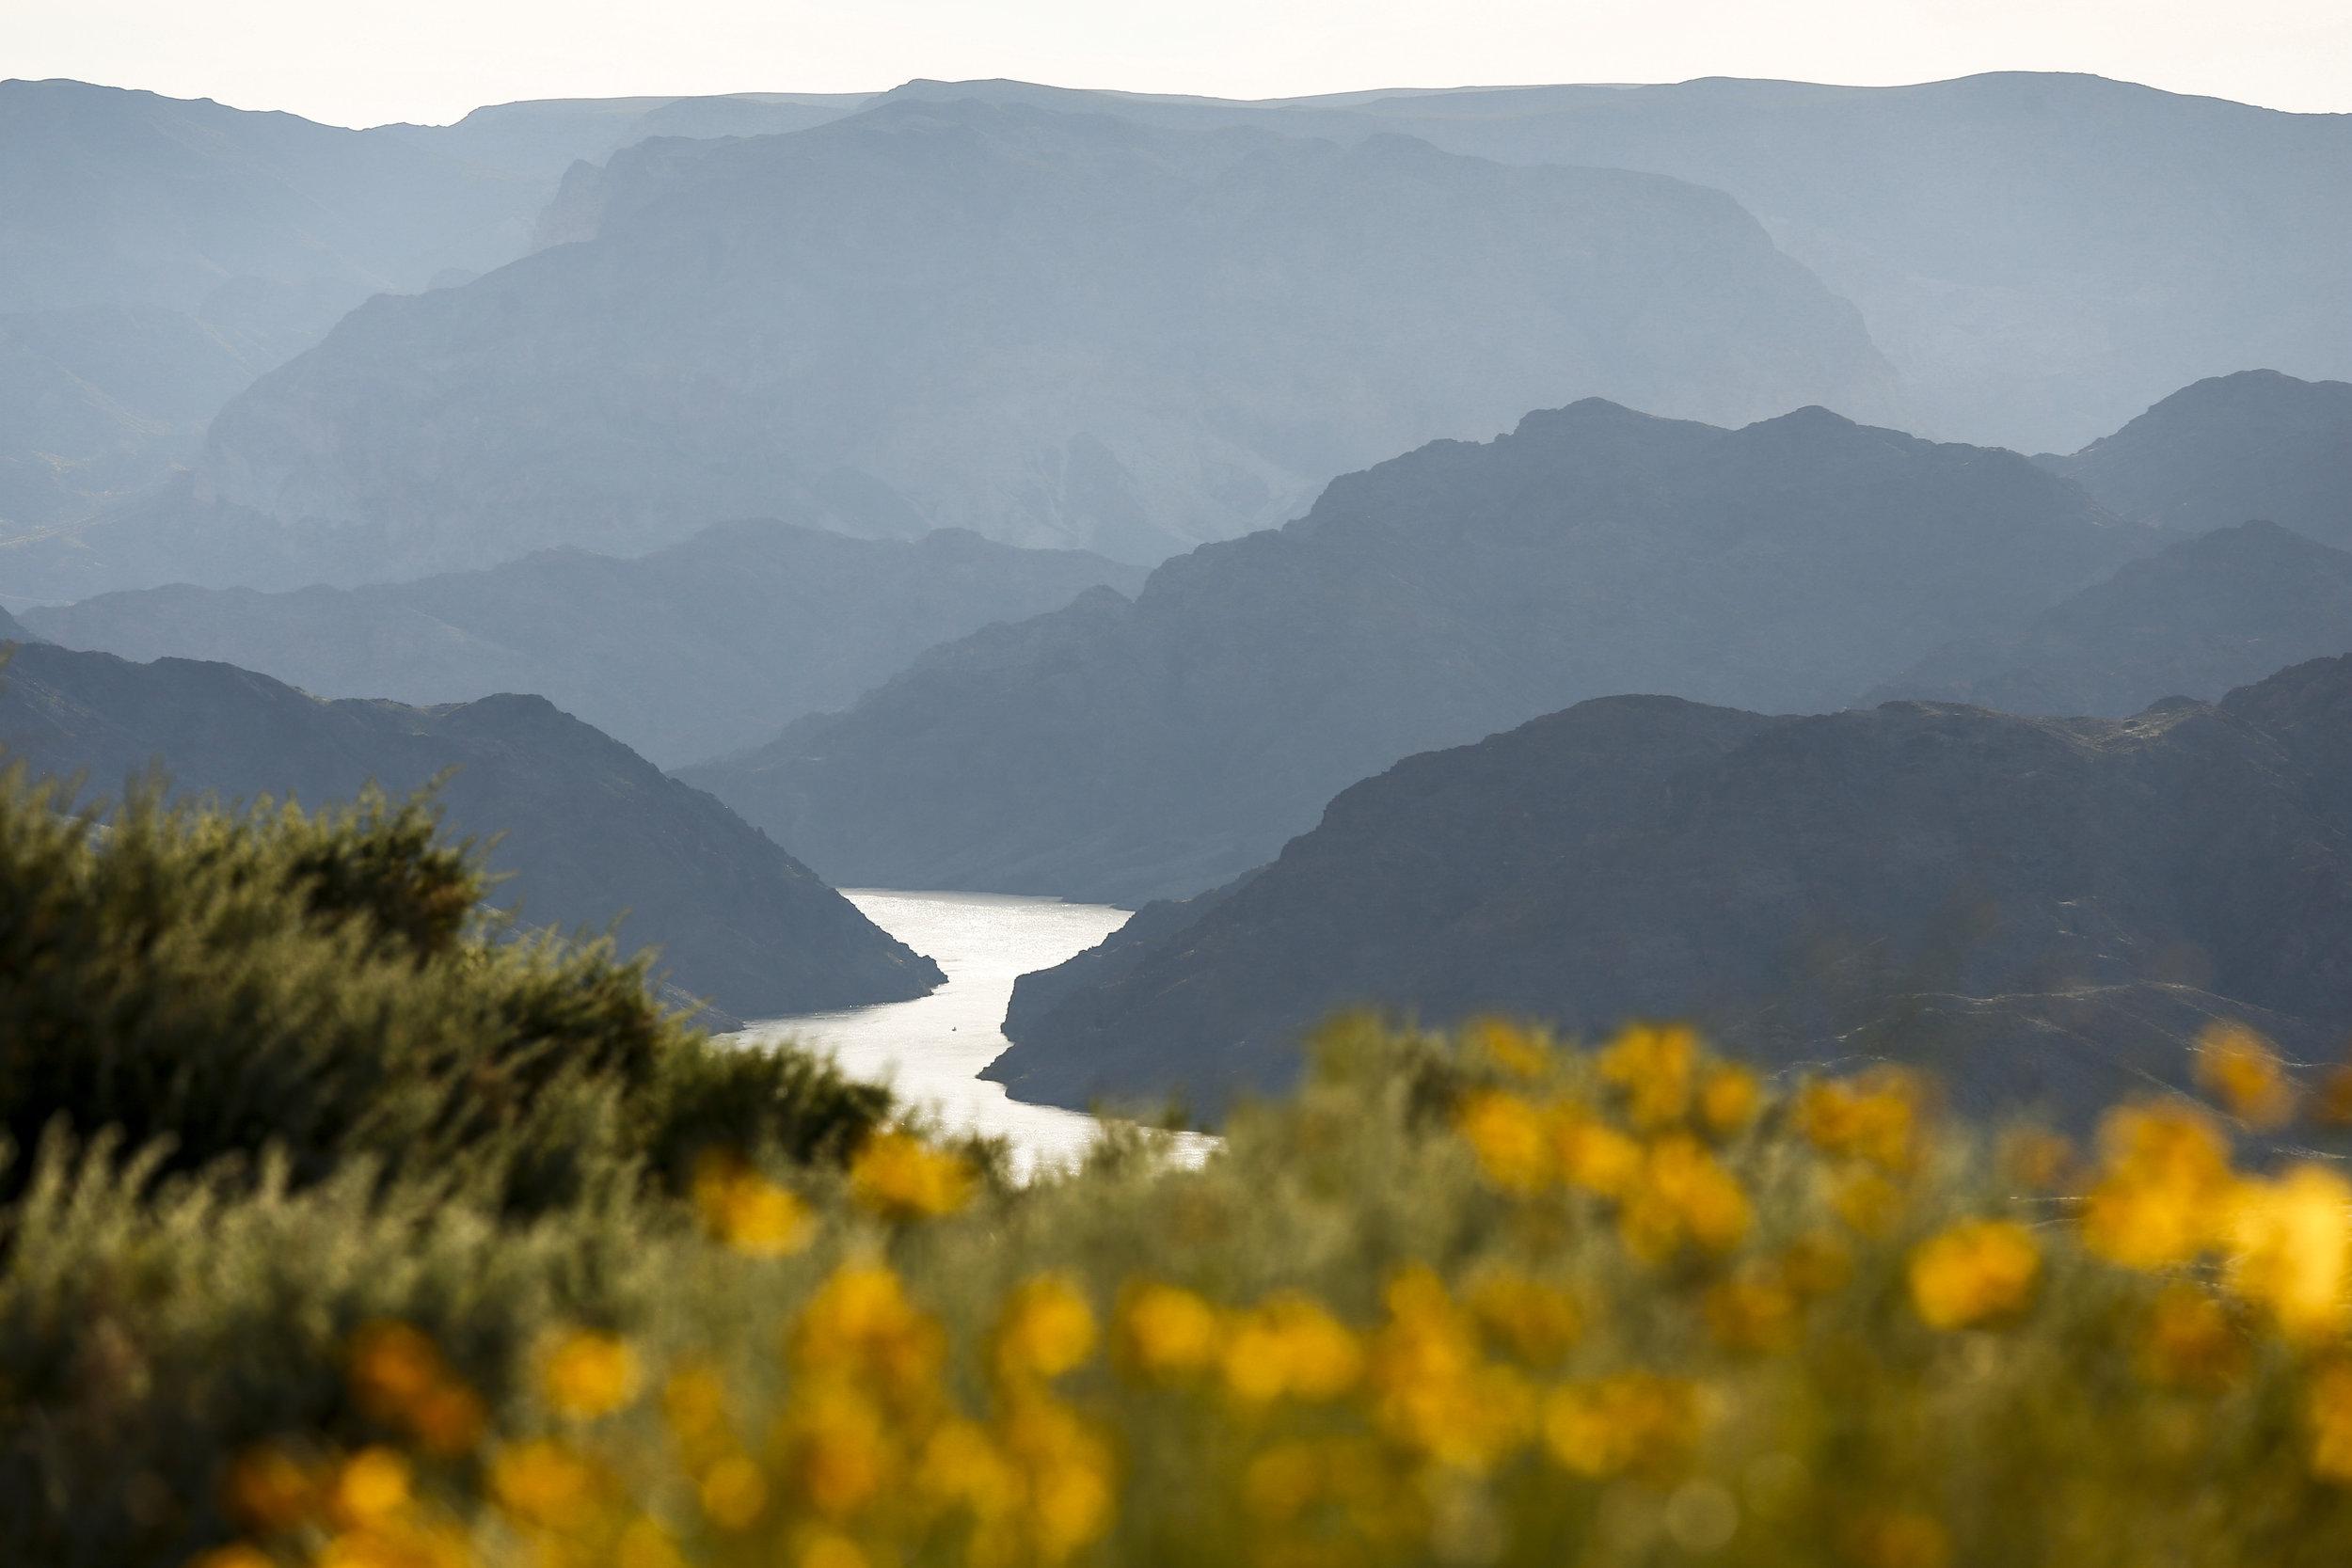 Colorado River carving its path